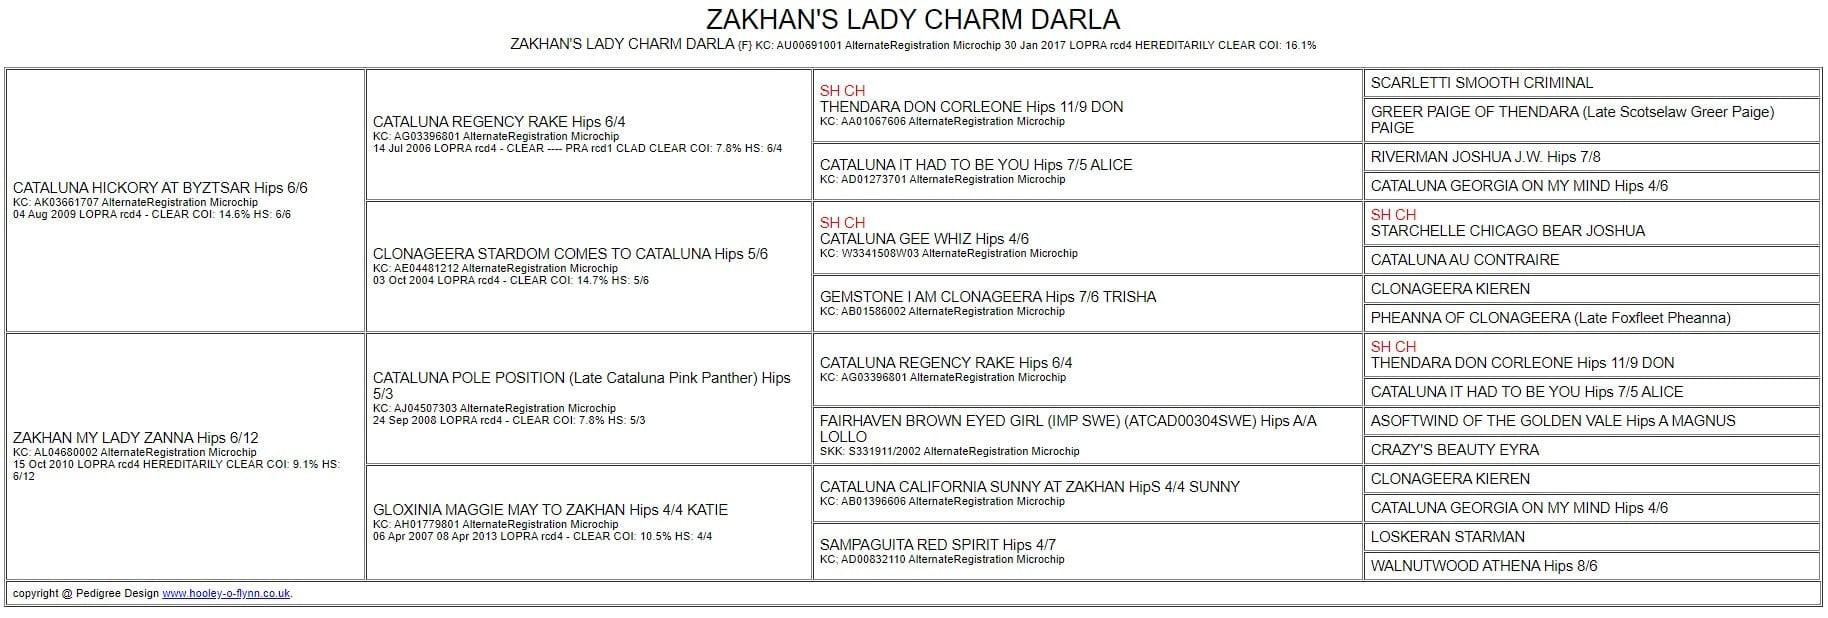 PEDIGREE: DARLA - ZAKHAN'S LADY CHARM